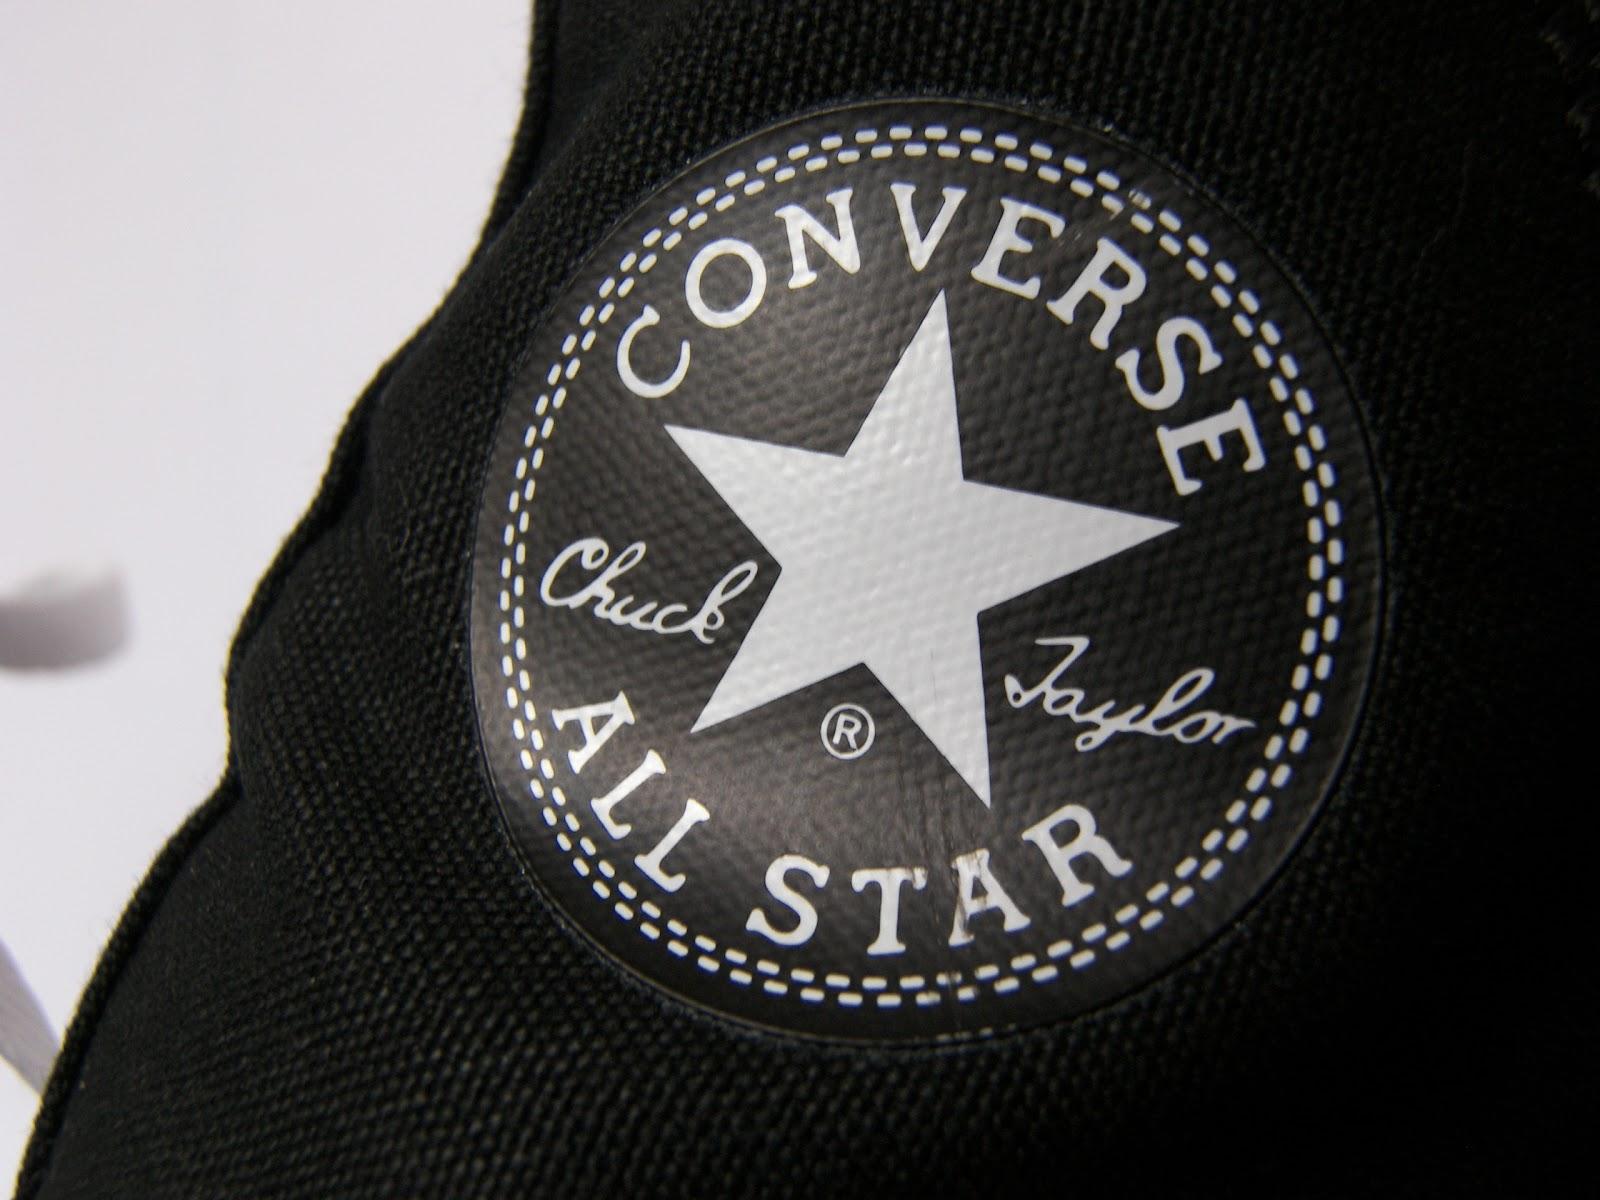 History of All Logos: All Converse Logos: logoshistory.blogspot.com/2010/12/all-converse-logos.html